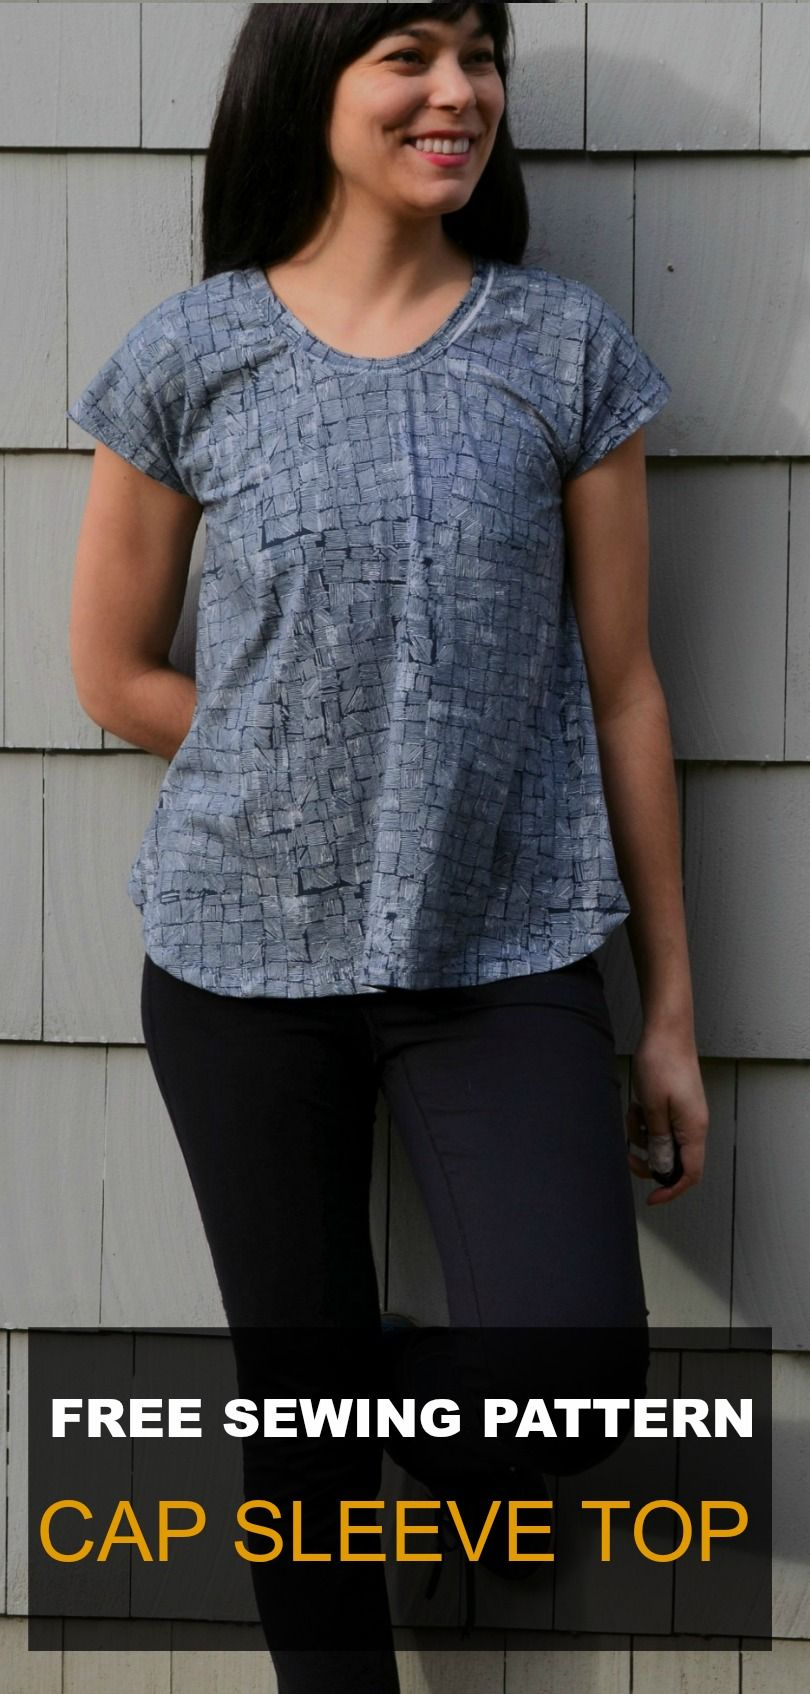 Free Sewing Pattern : CAP SLEEVE TOP | Pinterest | Sewing patterns ...